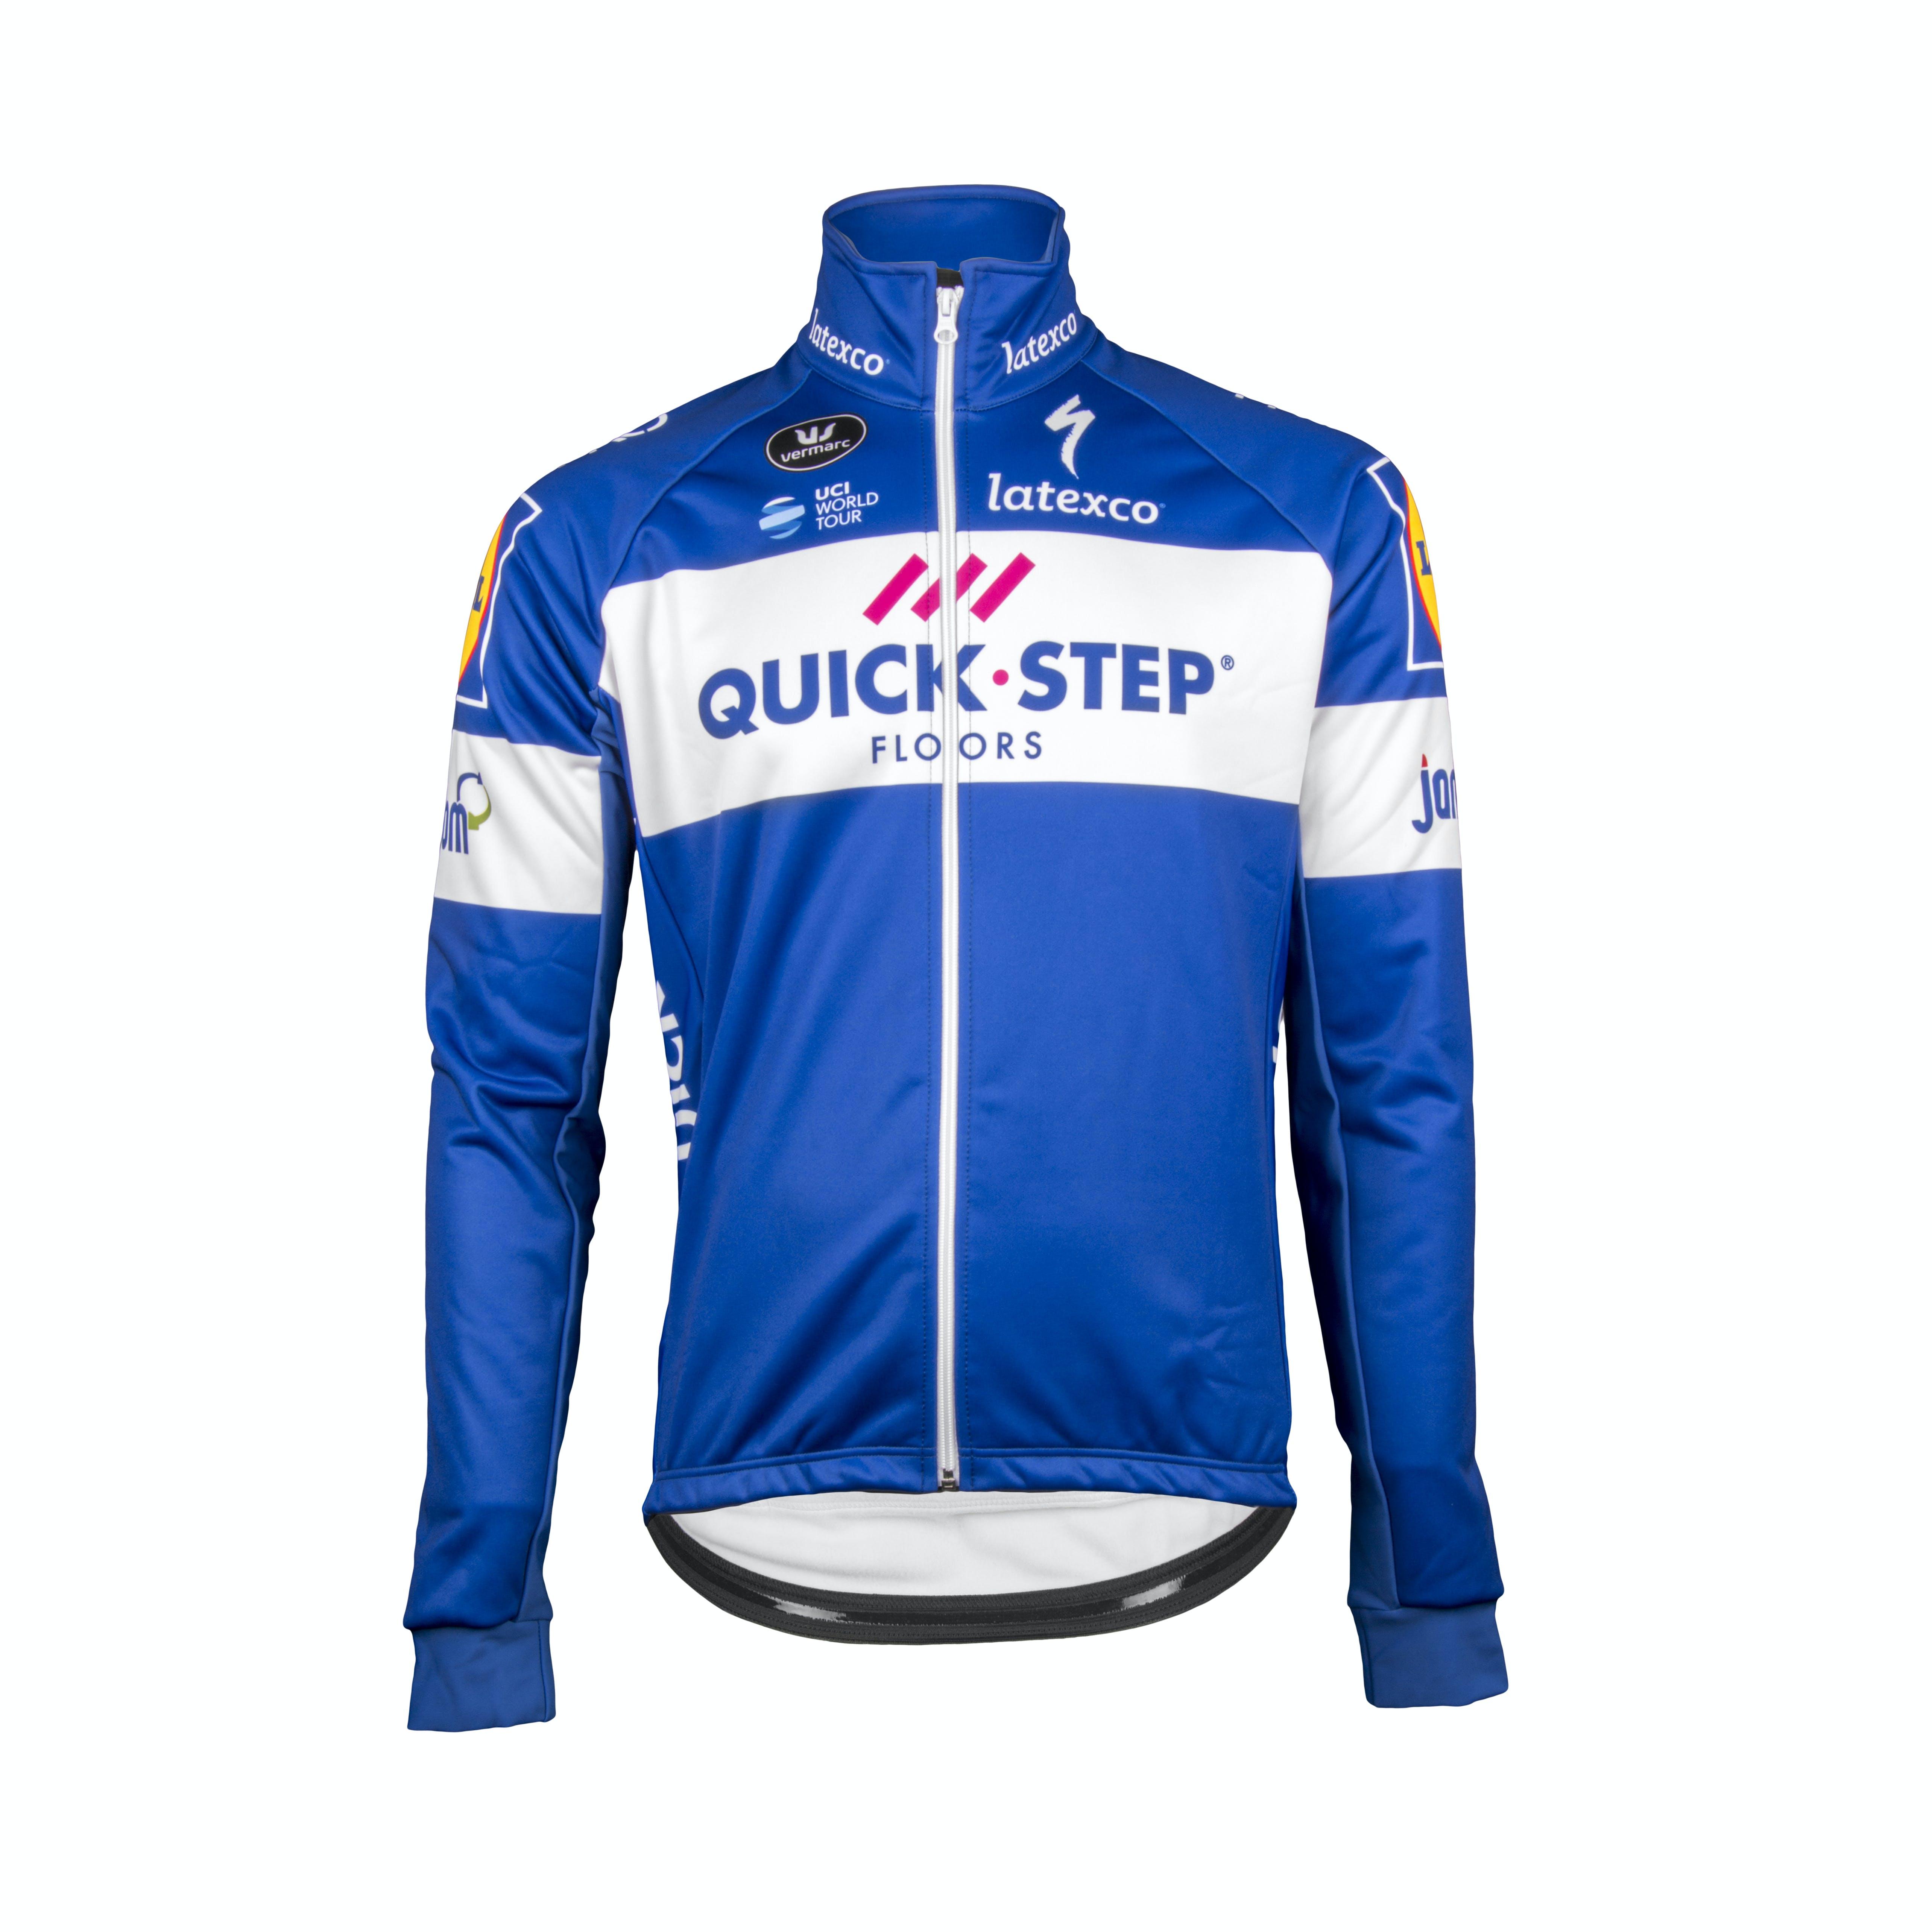 Quick-Step Floors 2018 Veste Technical